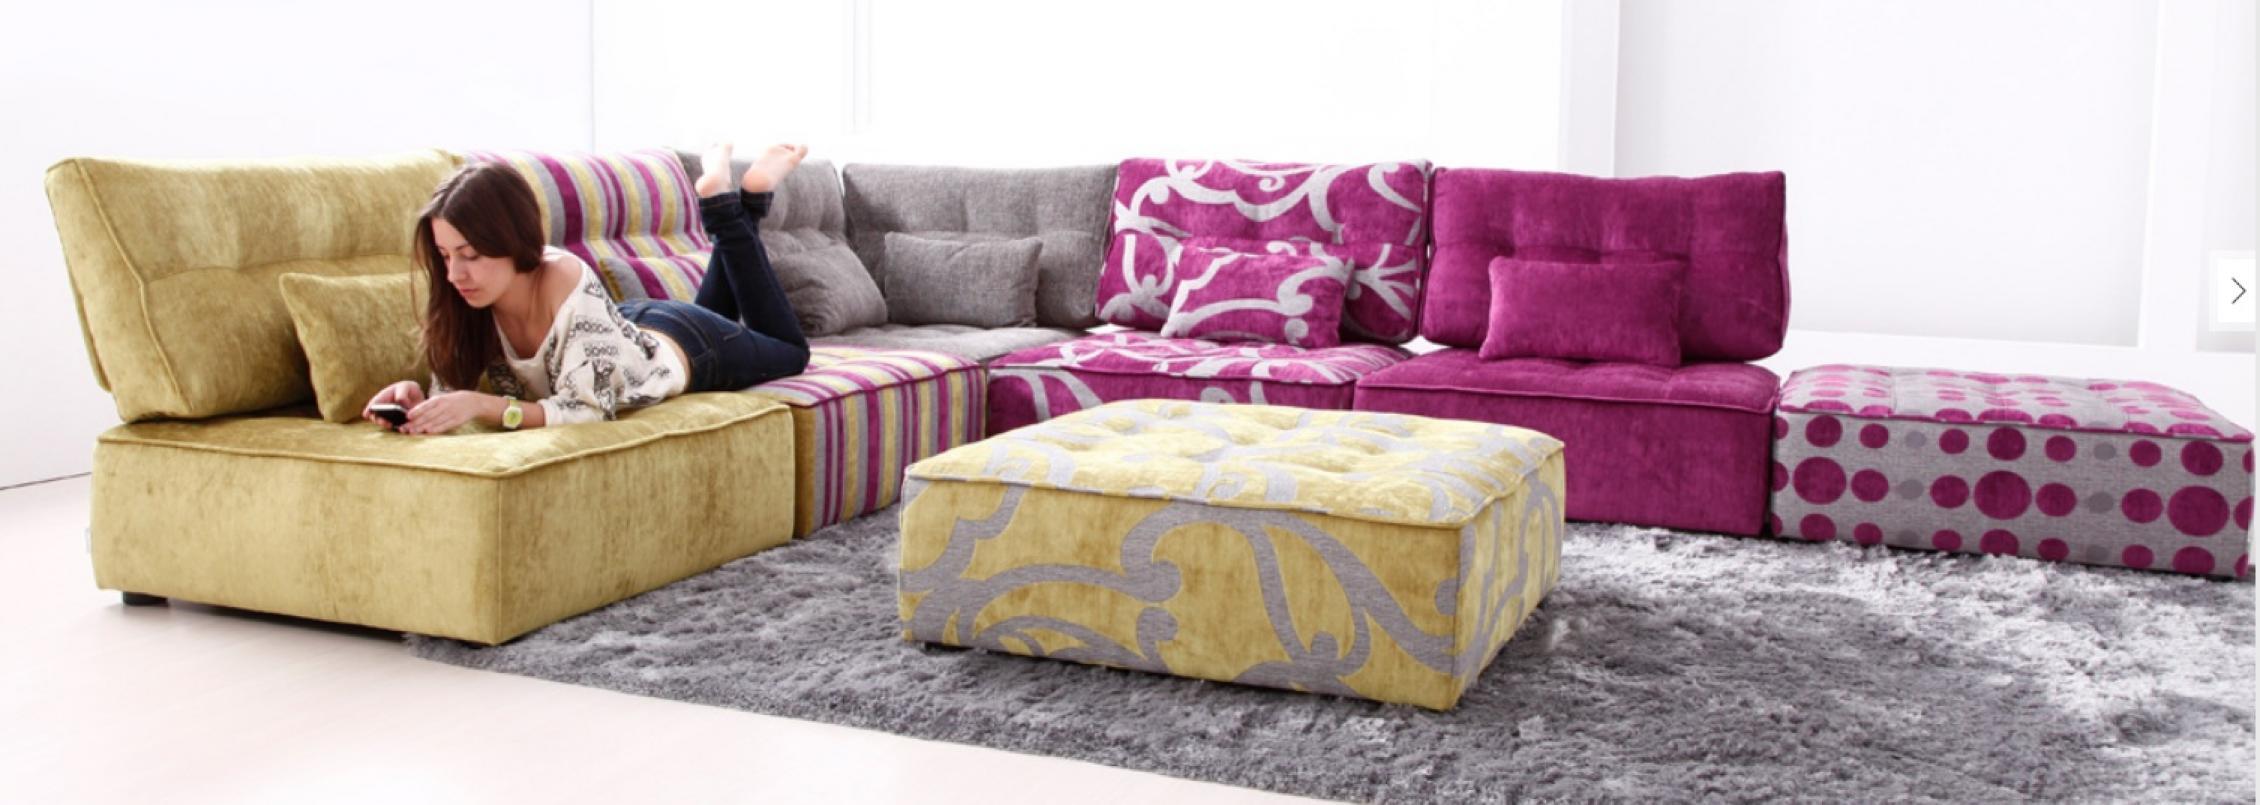 le bon coin 37 immobilier. Black Bedroom Furniture Sets. Home Design Ideas